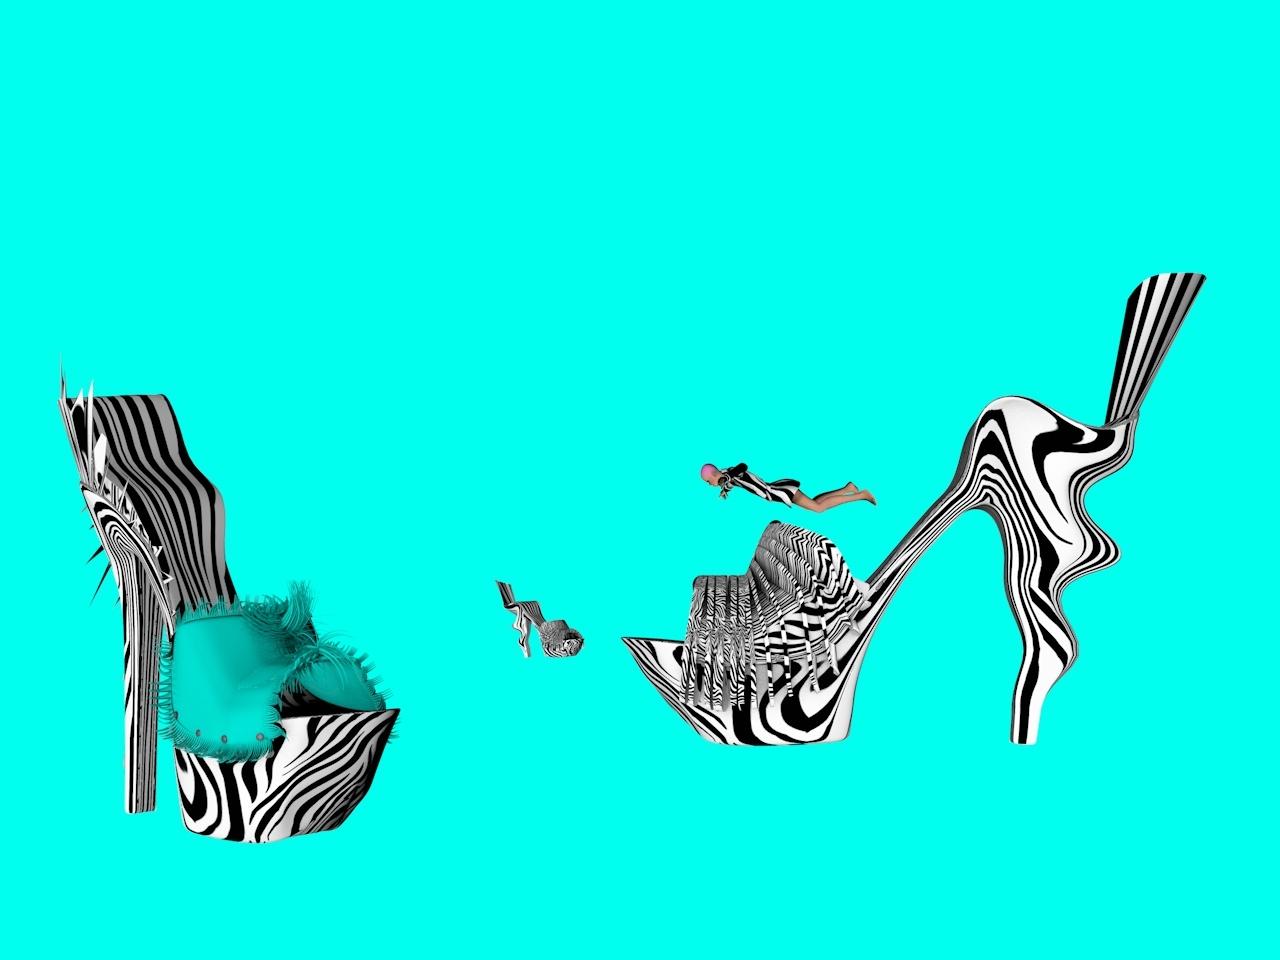 Swimming fashion 3dfilms animation fab design shoes design 3d illustration fashion design